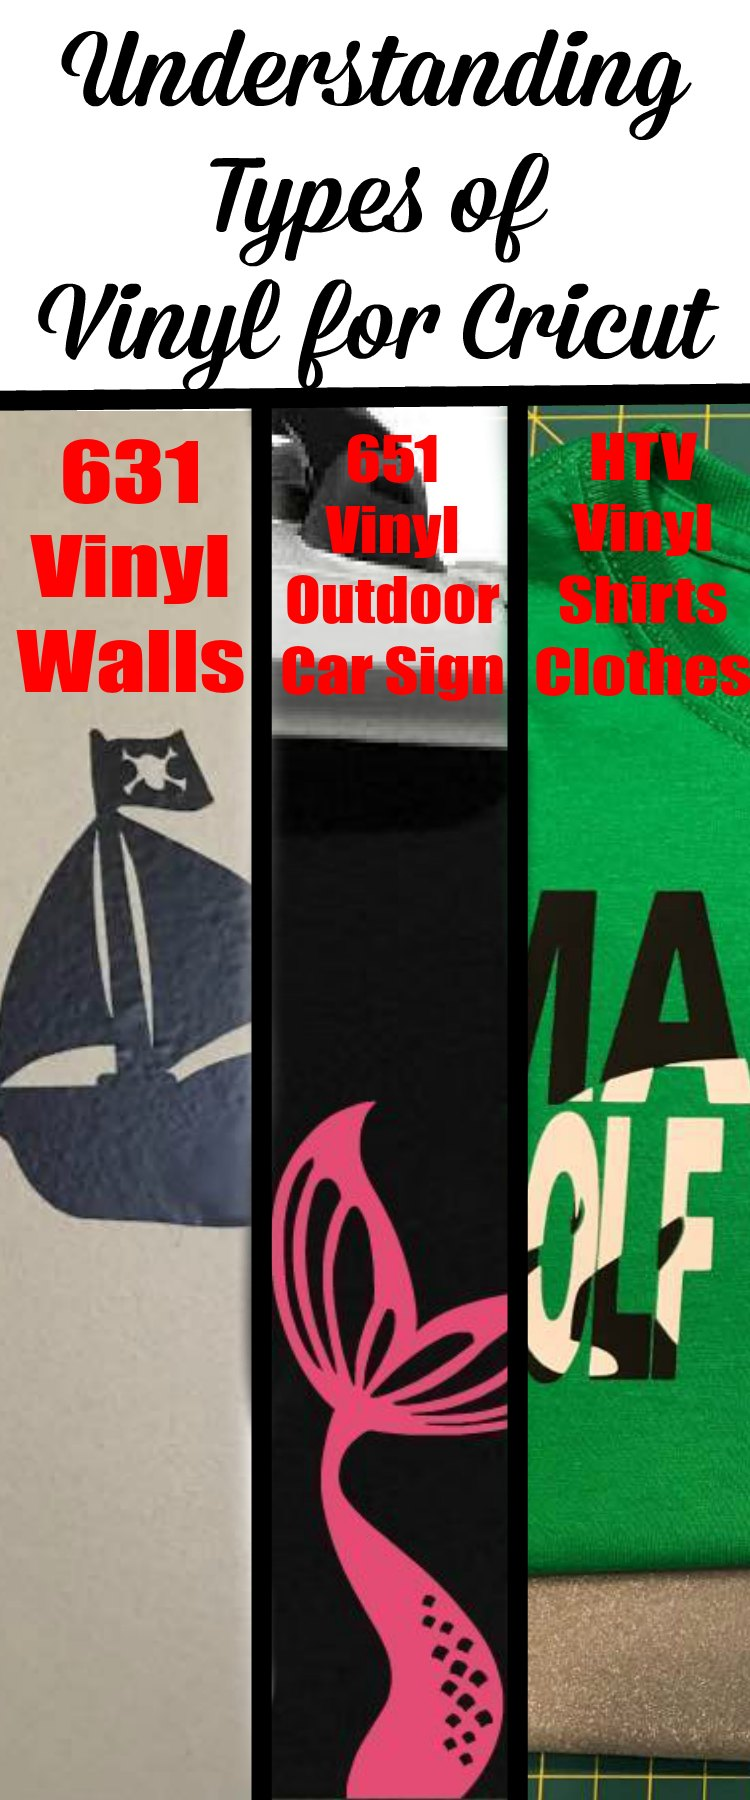 Types of Vinyl for Cricut Machine PIN